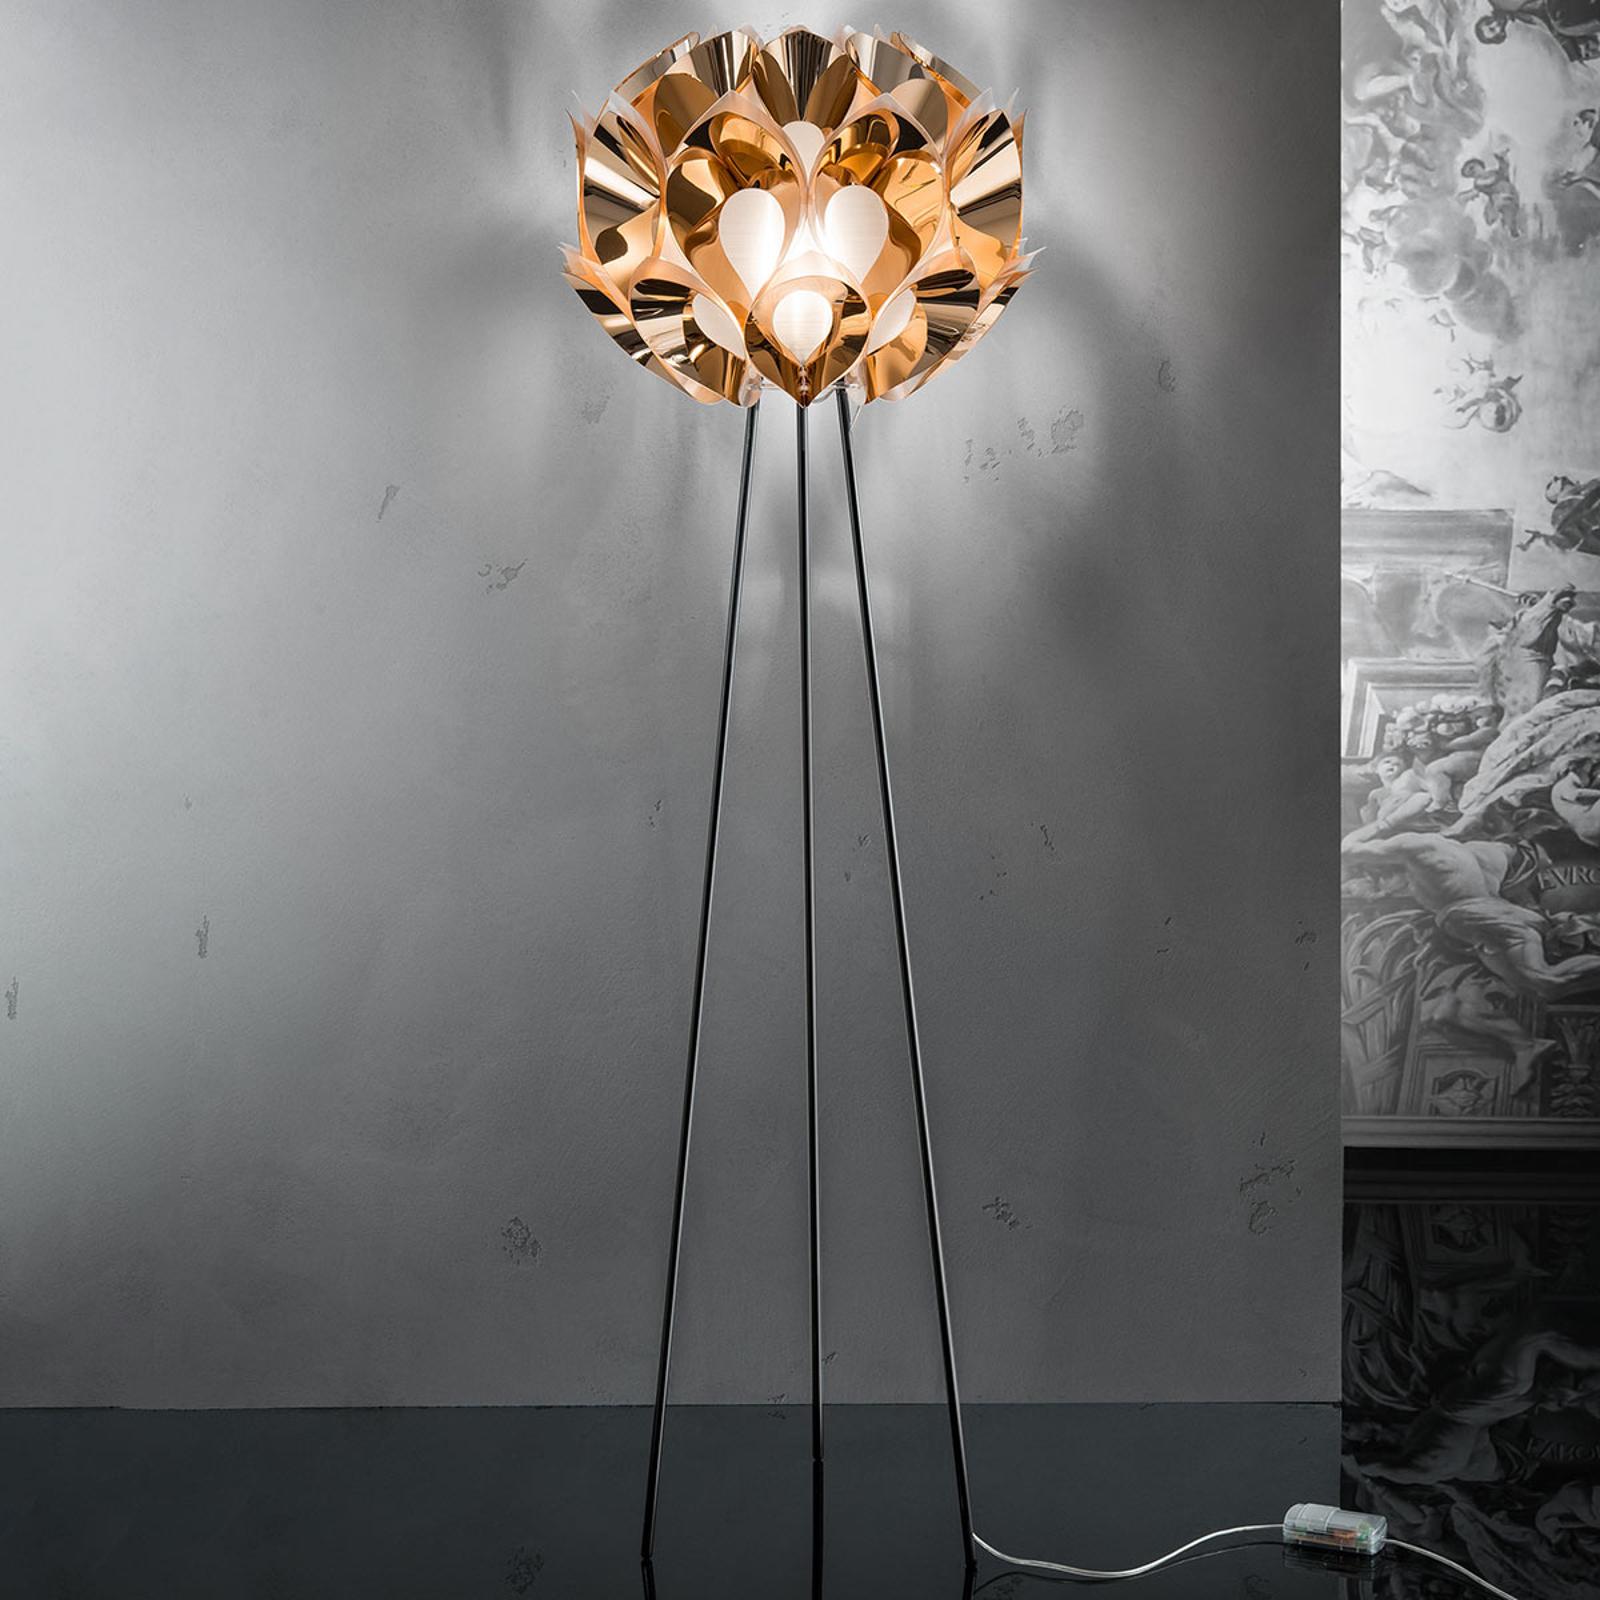 Flora - Lampadaire de designer en cuivre